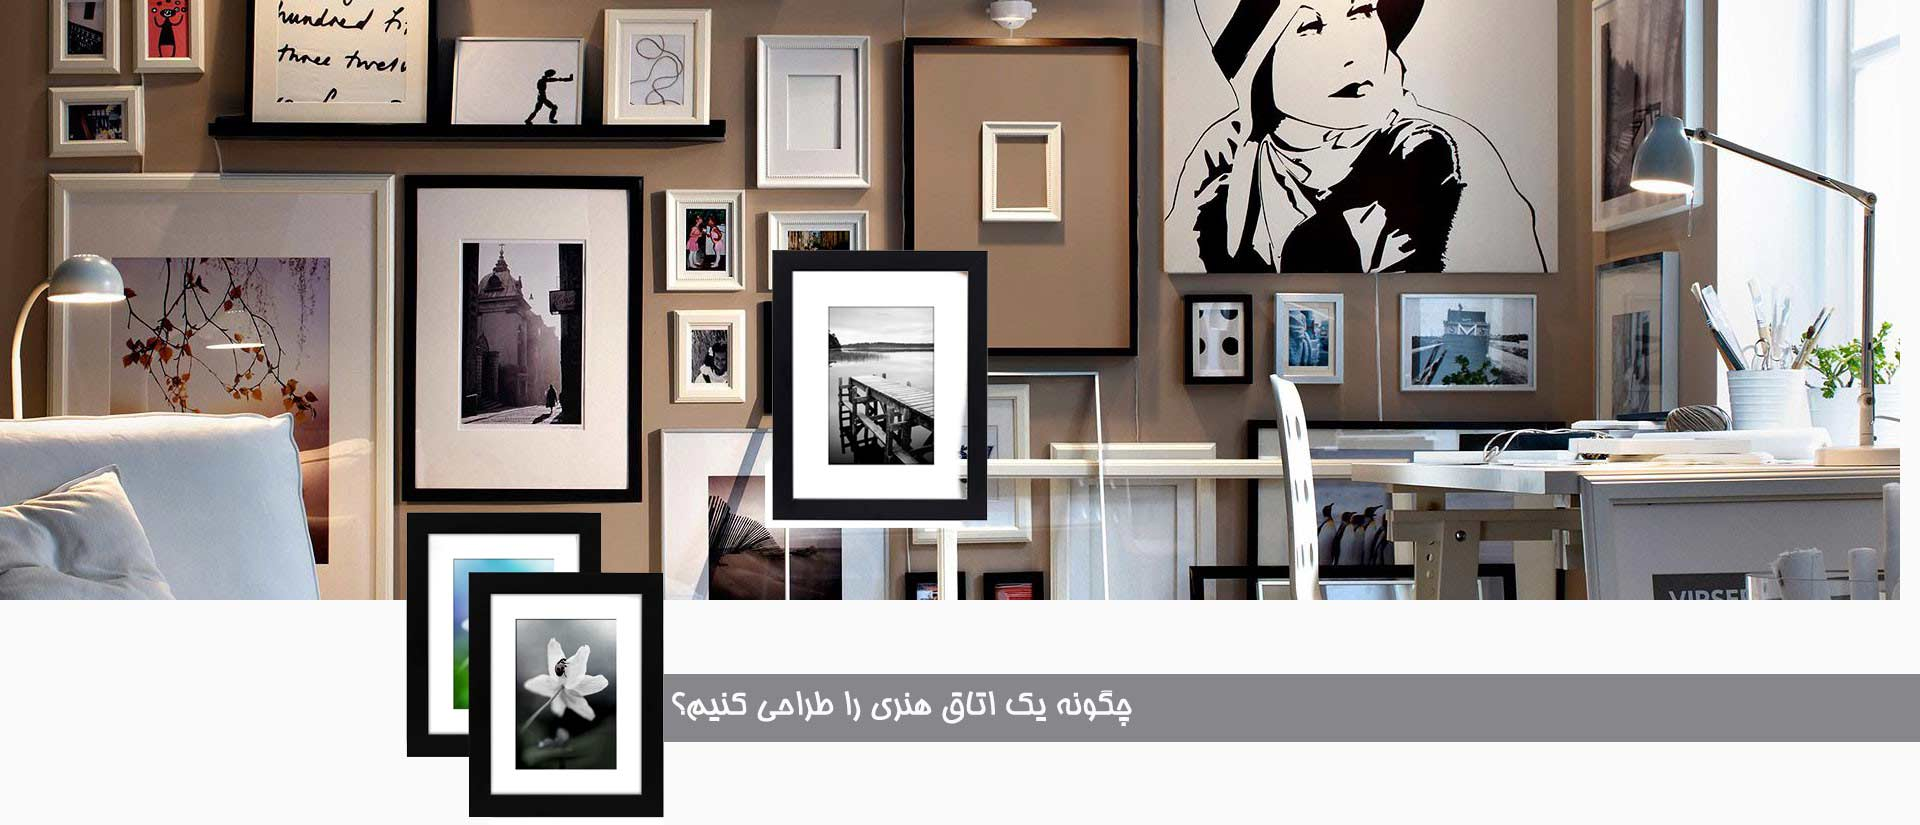 Design An Art centric Room2jpg - چگونه یک اتاق هنری را طراحی کنیم؟